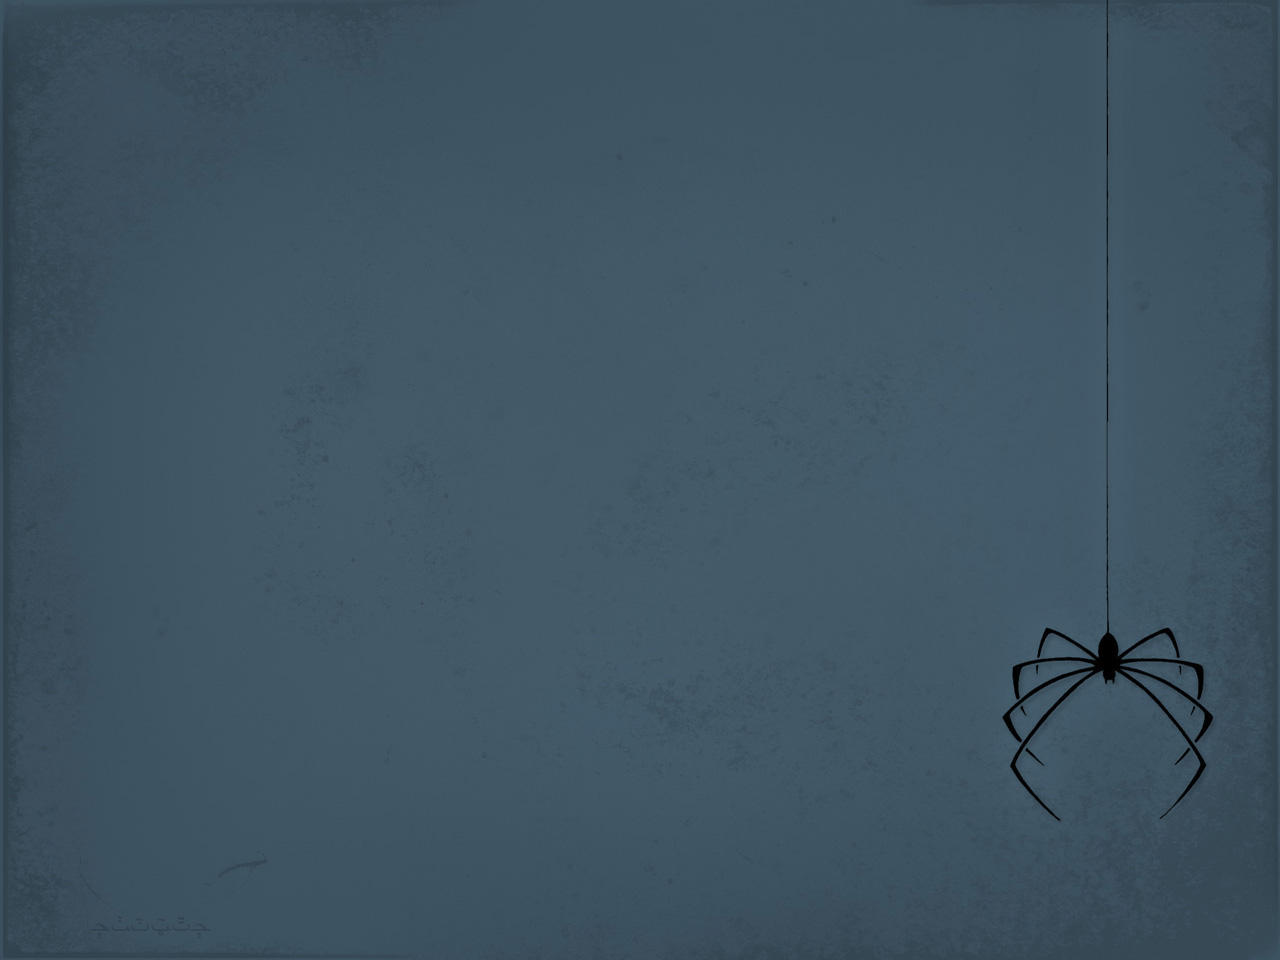 Spider by grevenlx